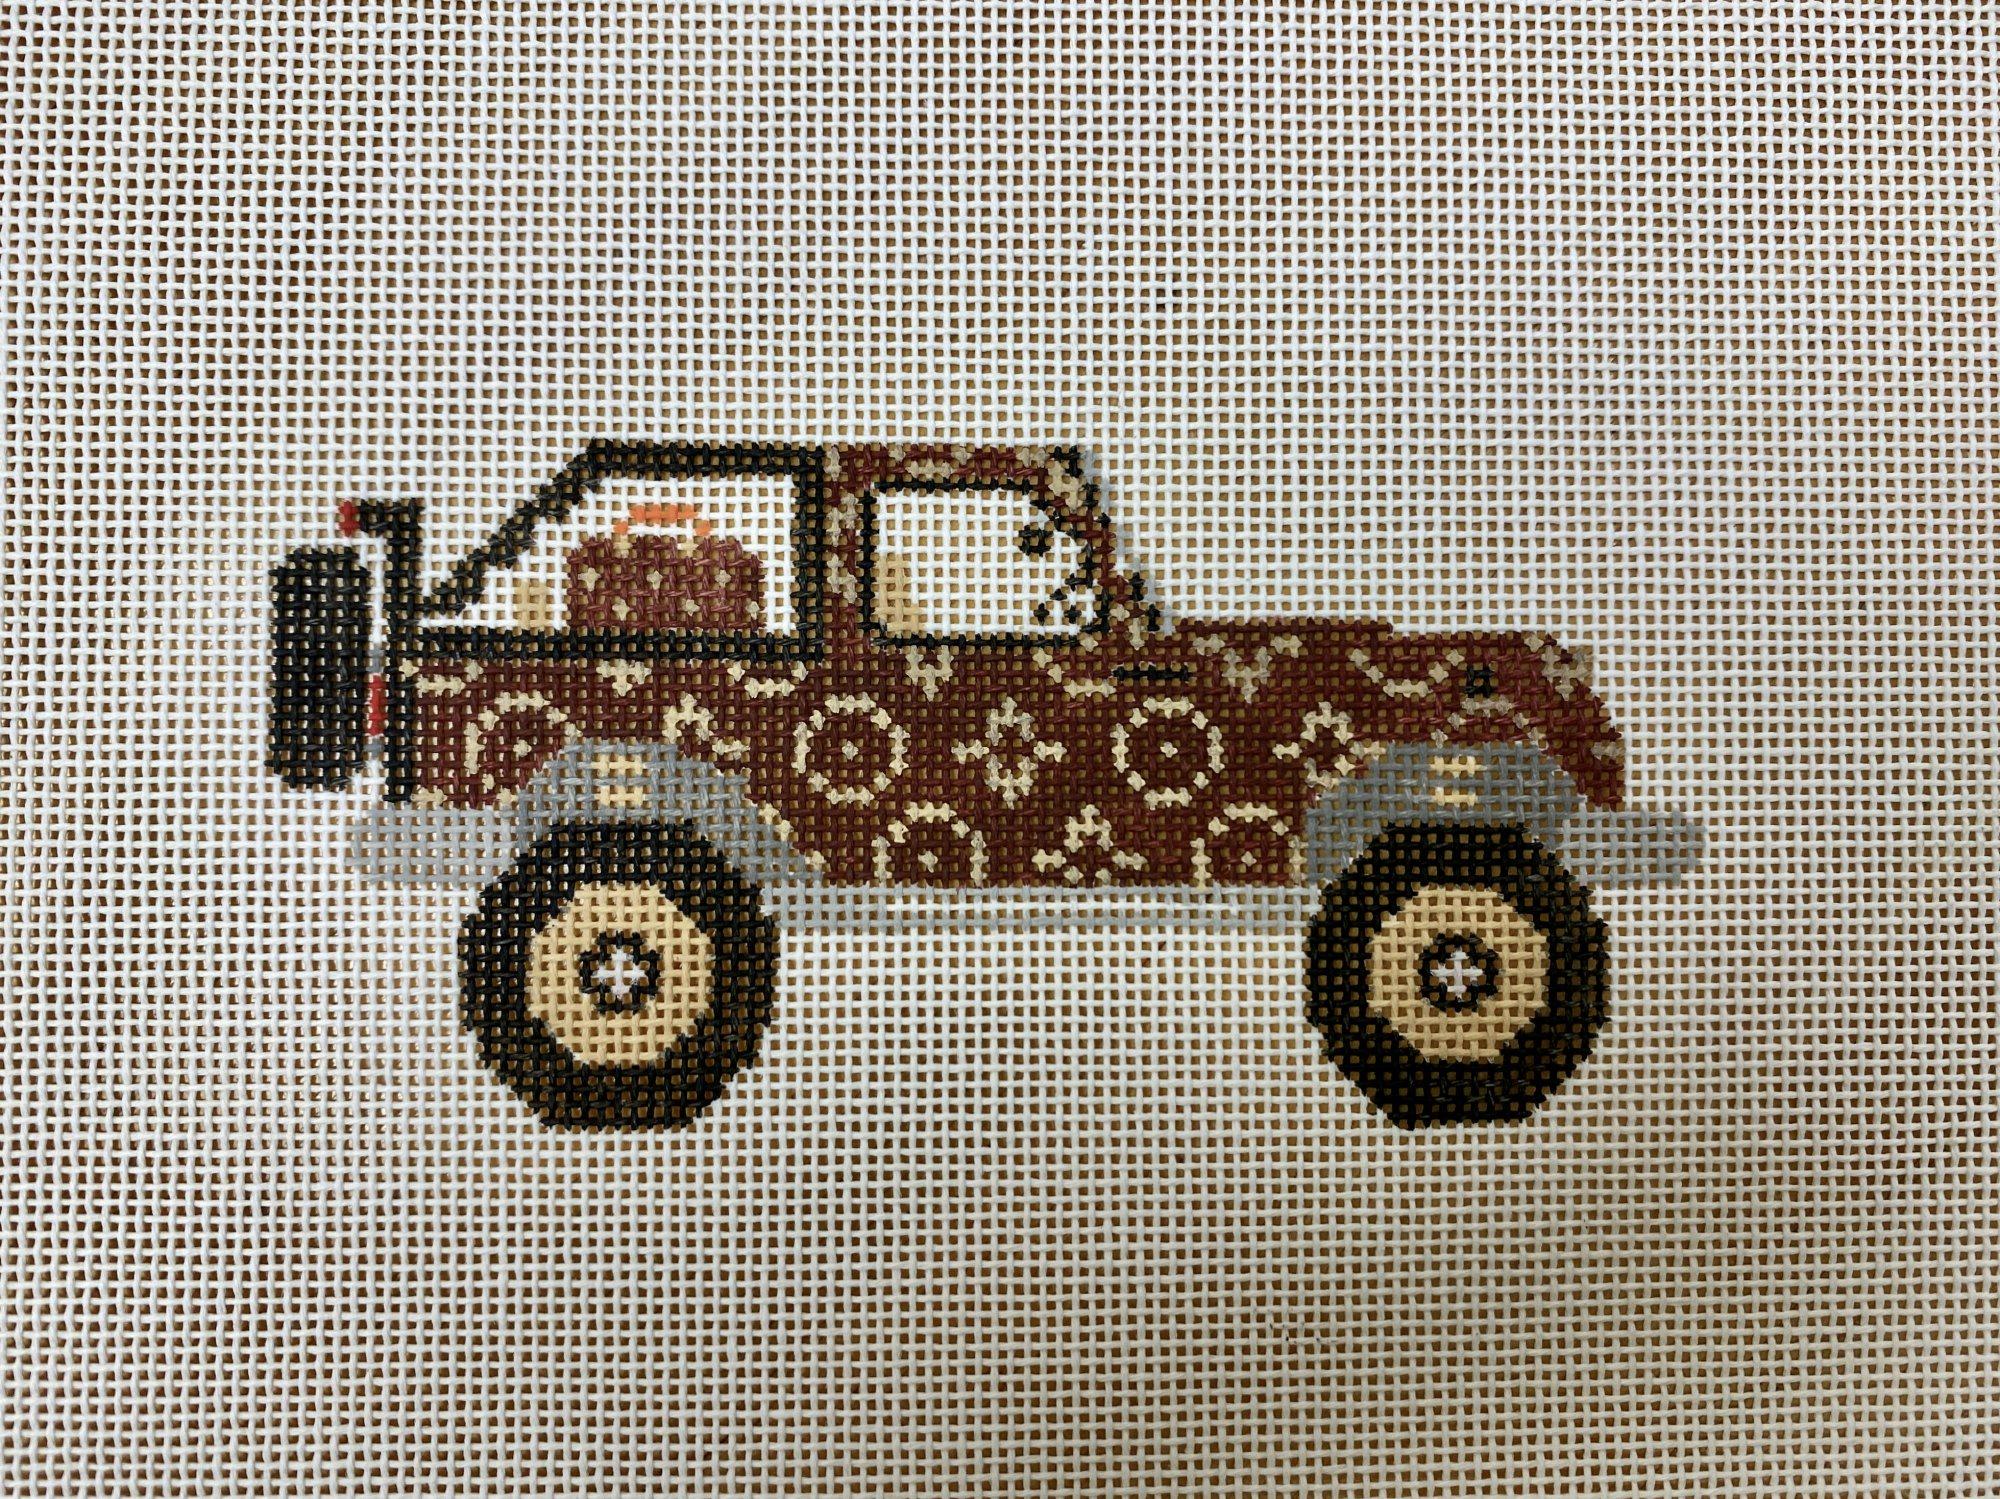 jeep, lv